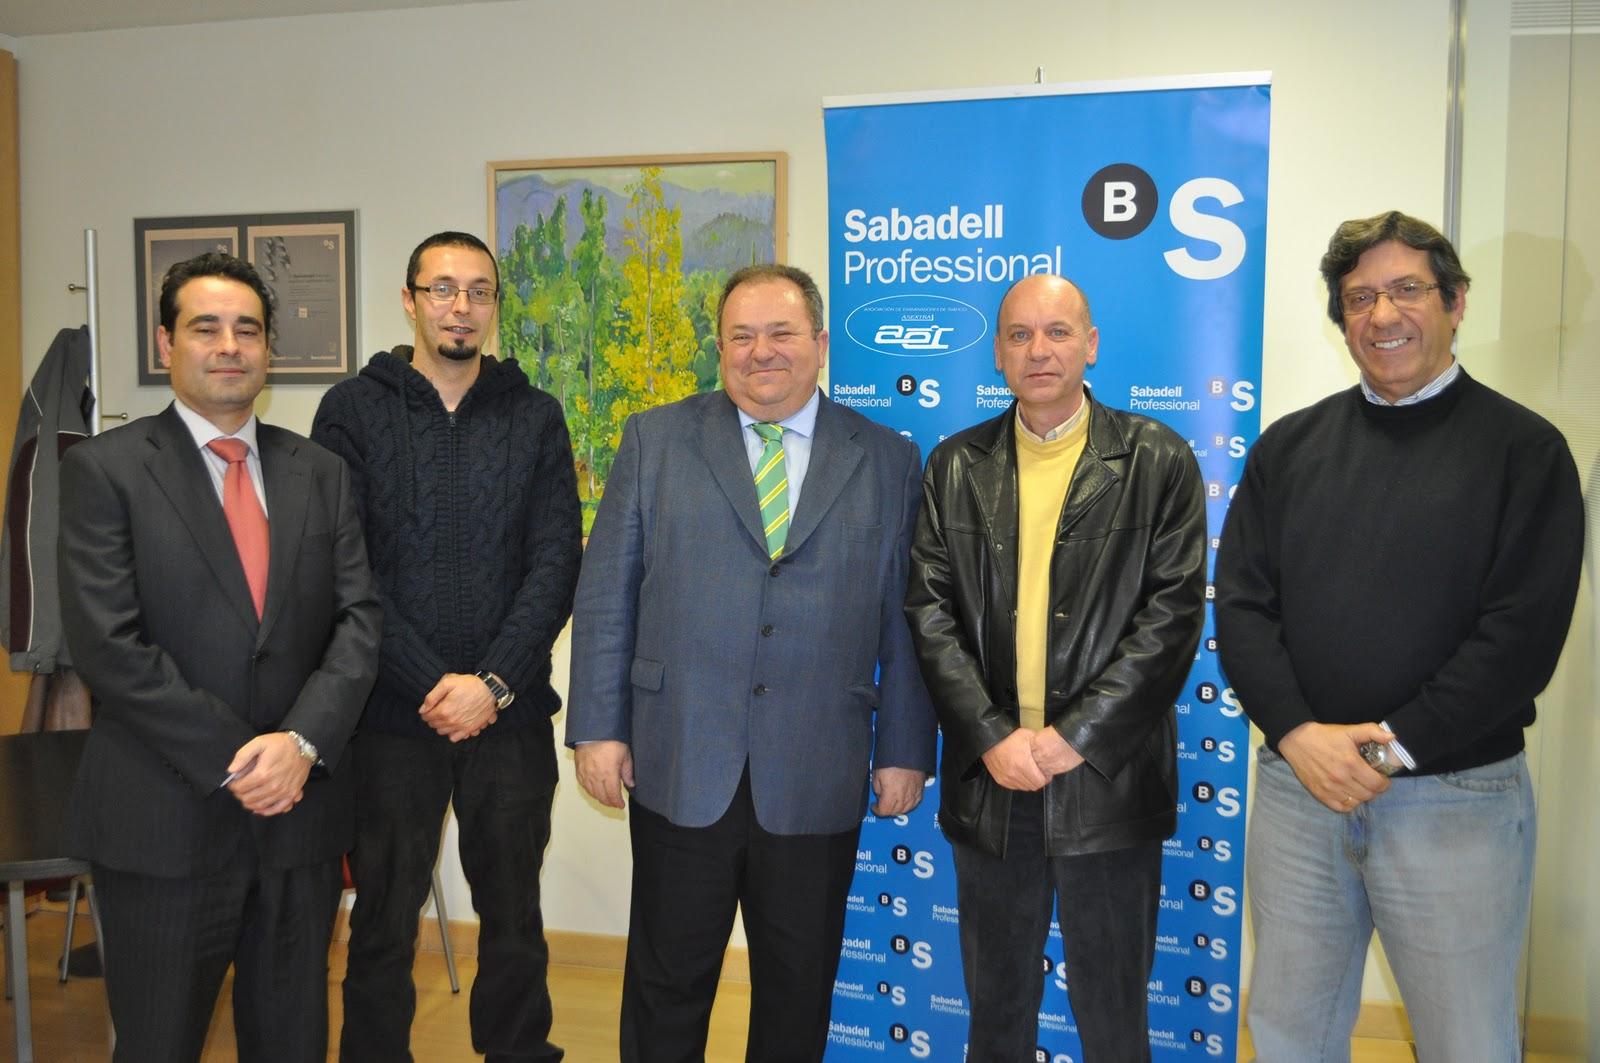 Asociaci n de examinadores de tr fico enero 2012 for Oficina sabadell sevilla